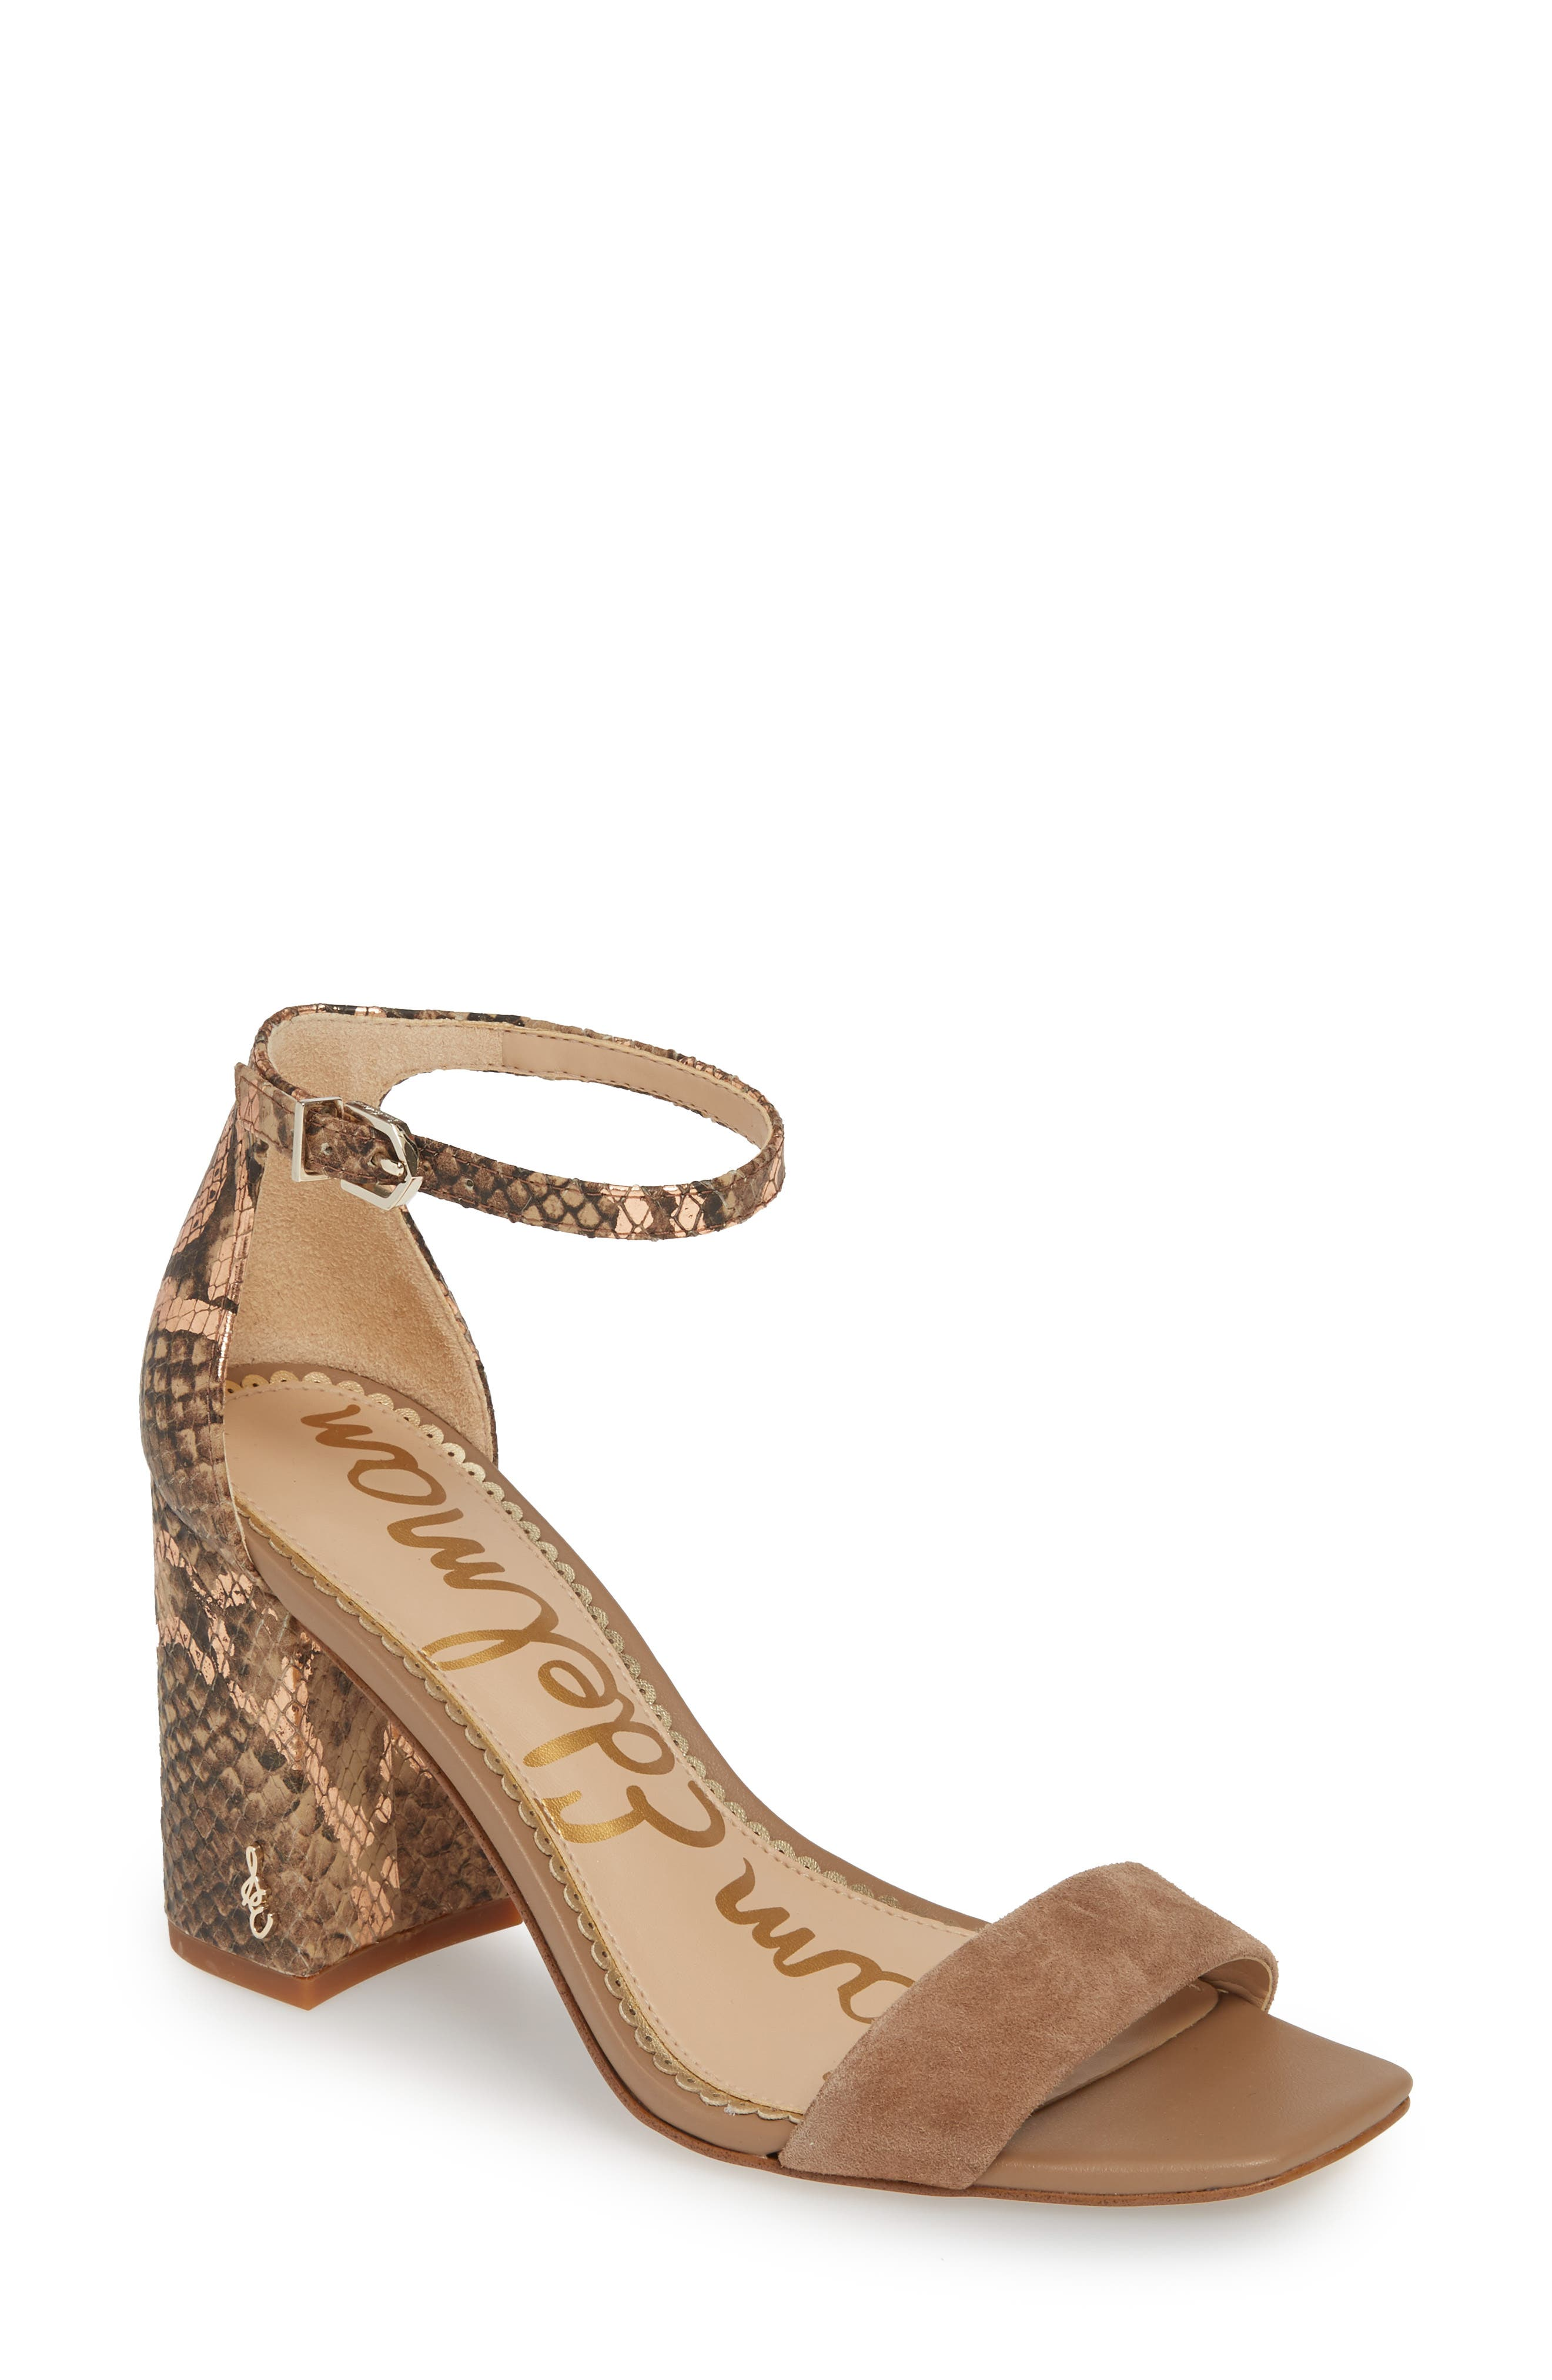 Image of Sam Edelman Daniella Snakeskin Embossed Block Heel Sandal